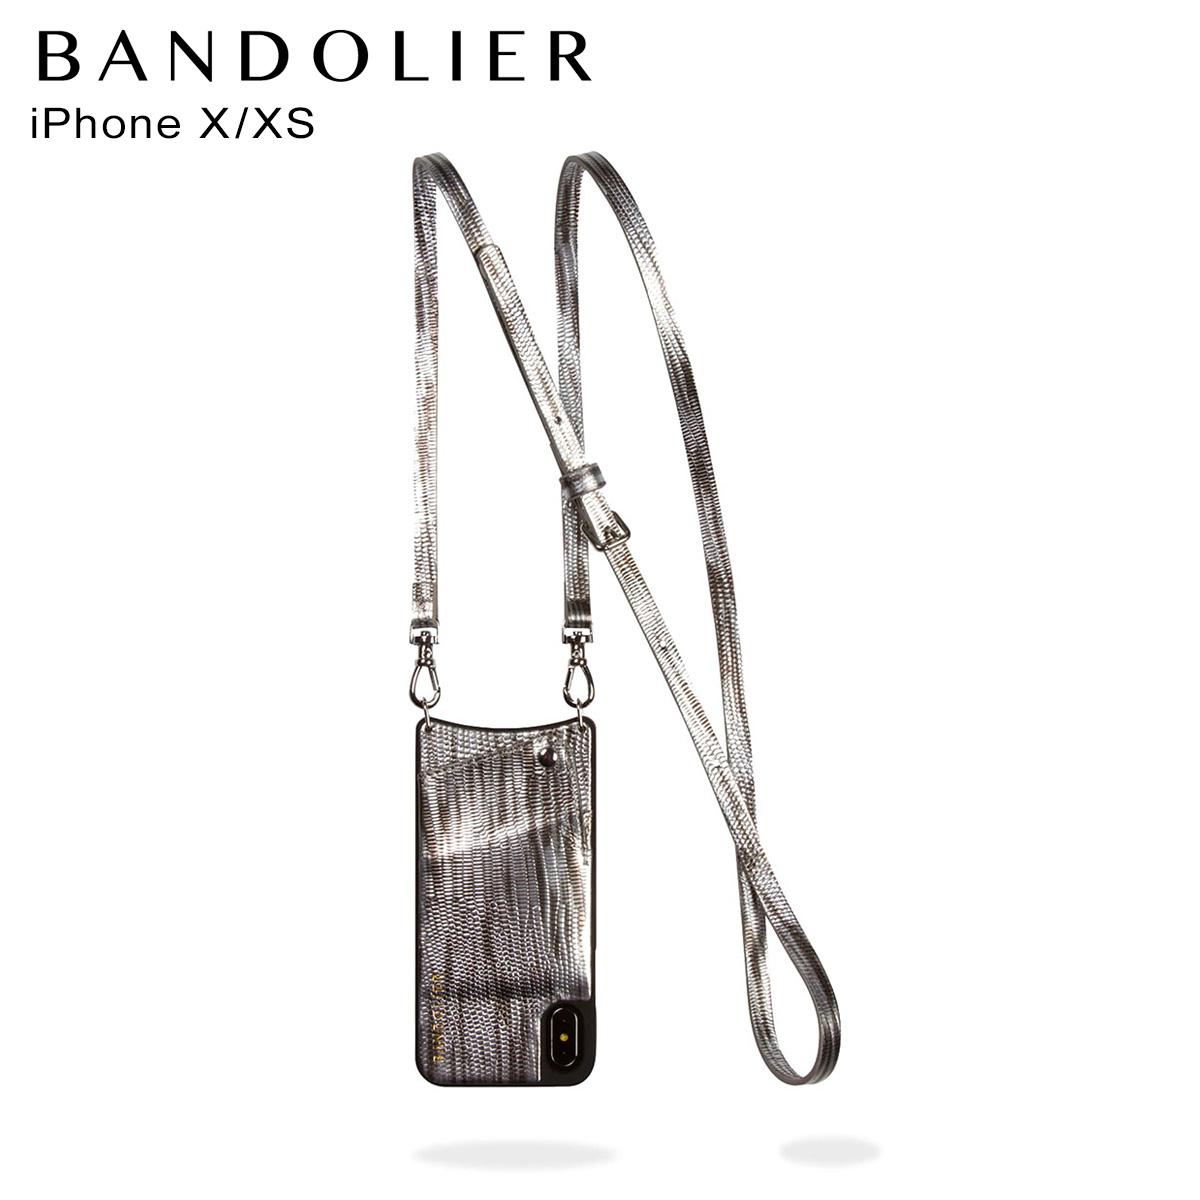 BANDOLIER バンドリヤー iPhone XS X ケース スマホ 携帯 アイフォン EMMA SILVER WAVE メンズ レディース シルバー 10EMM